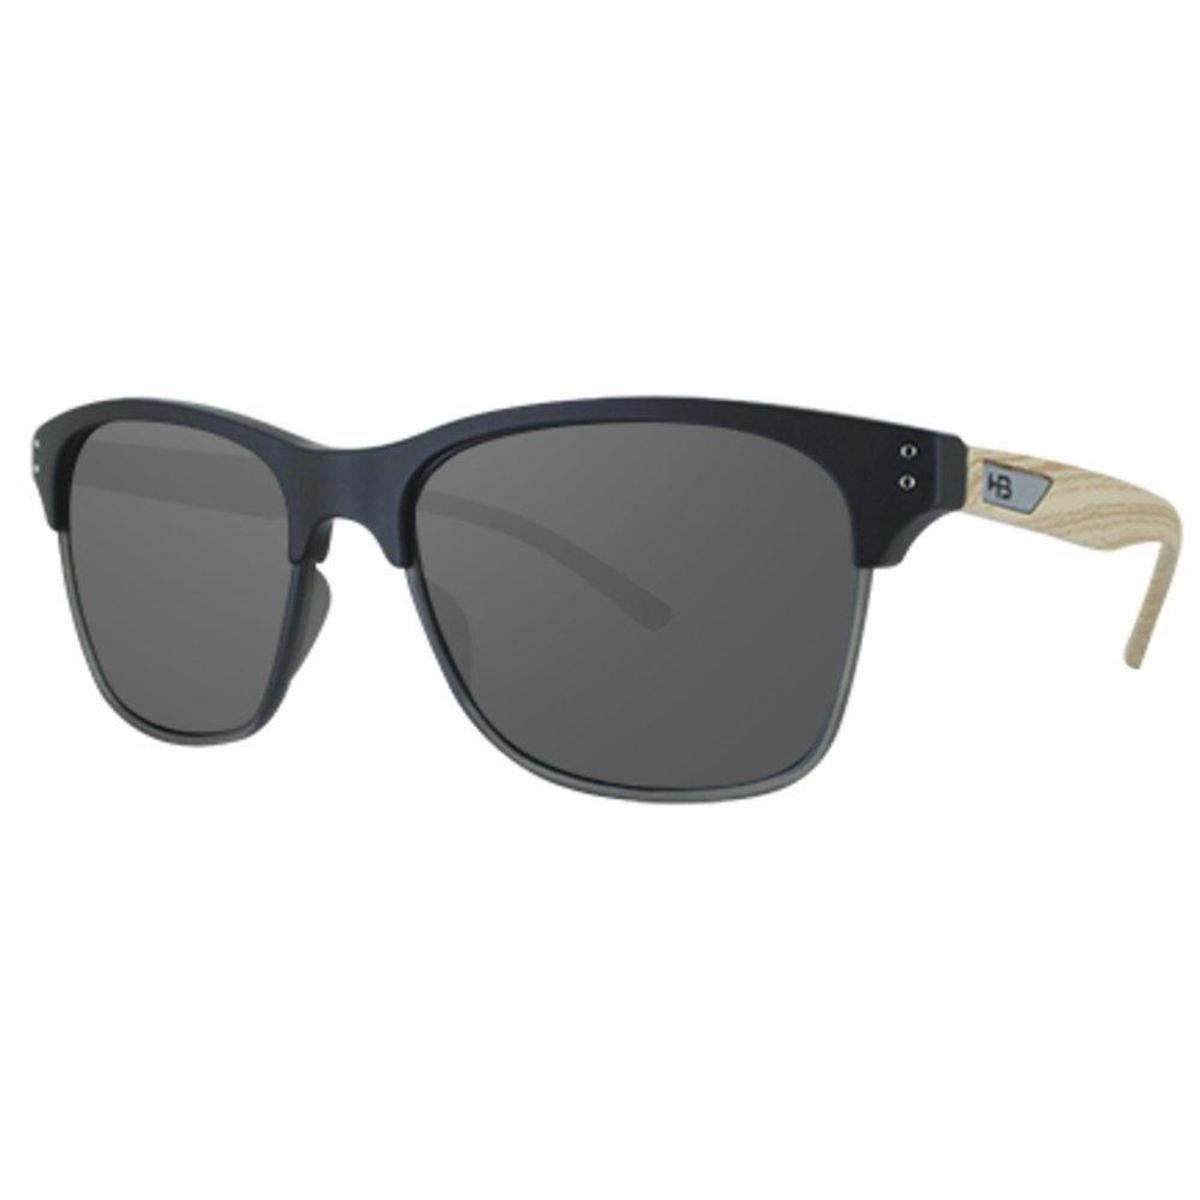 Óculos De Sol Hb Slam Fish - Compre Agora   Netshoes c37ff8e447